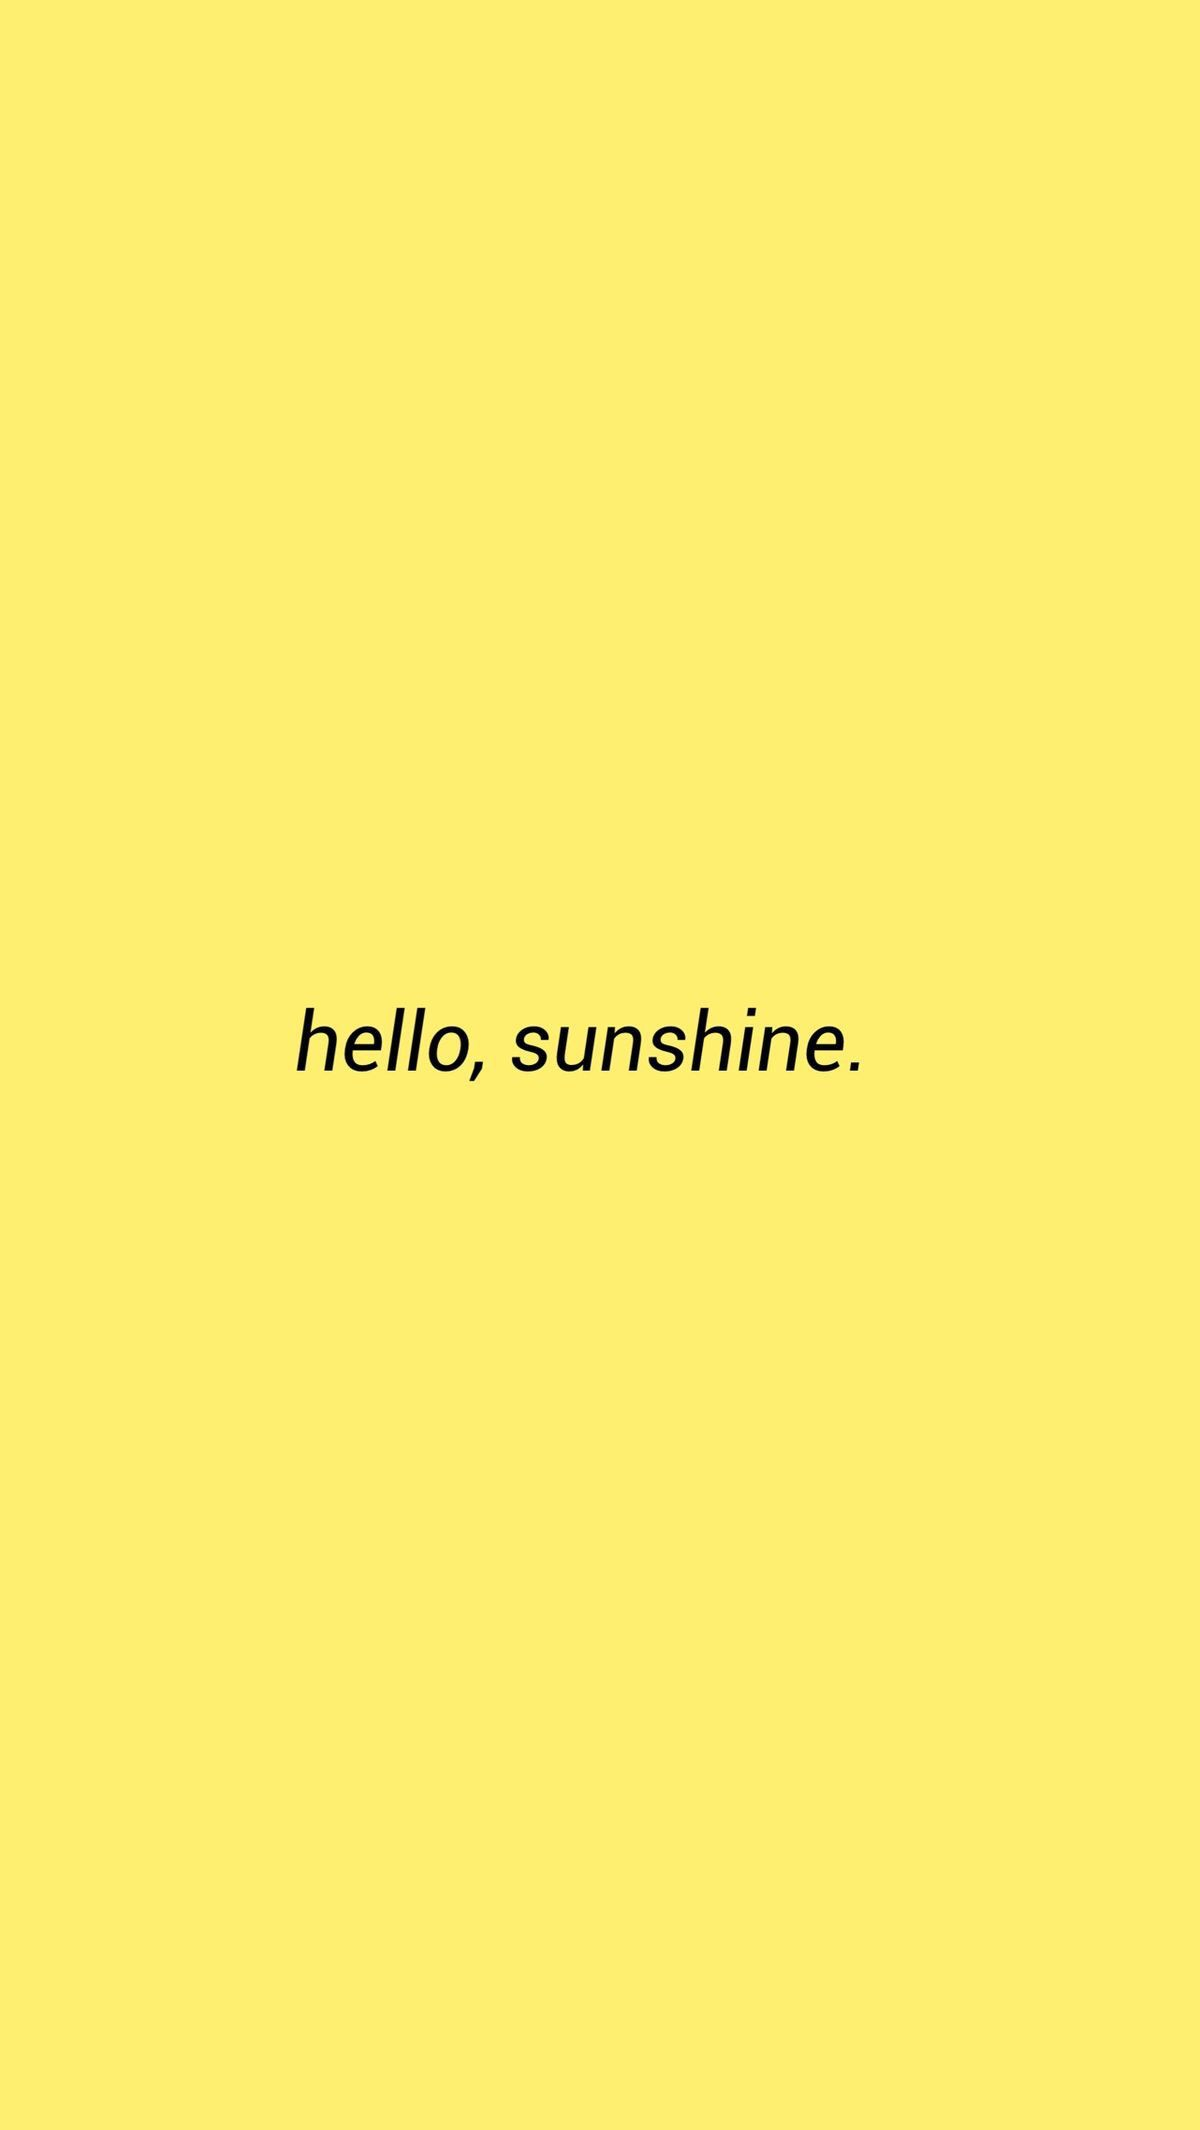 Pastel Iphone Wallpaper Tumblr Yellow